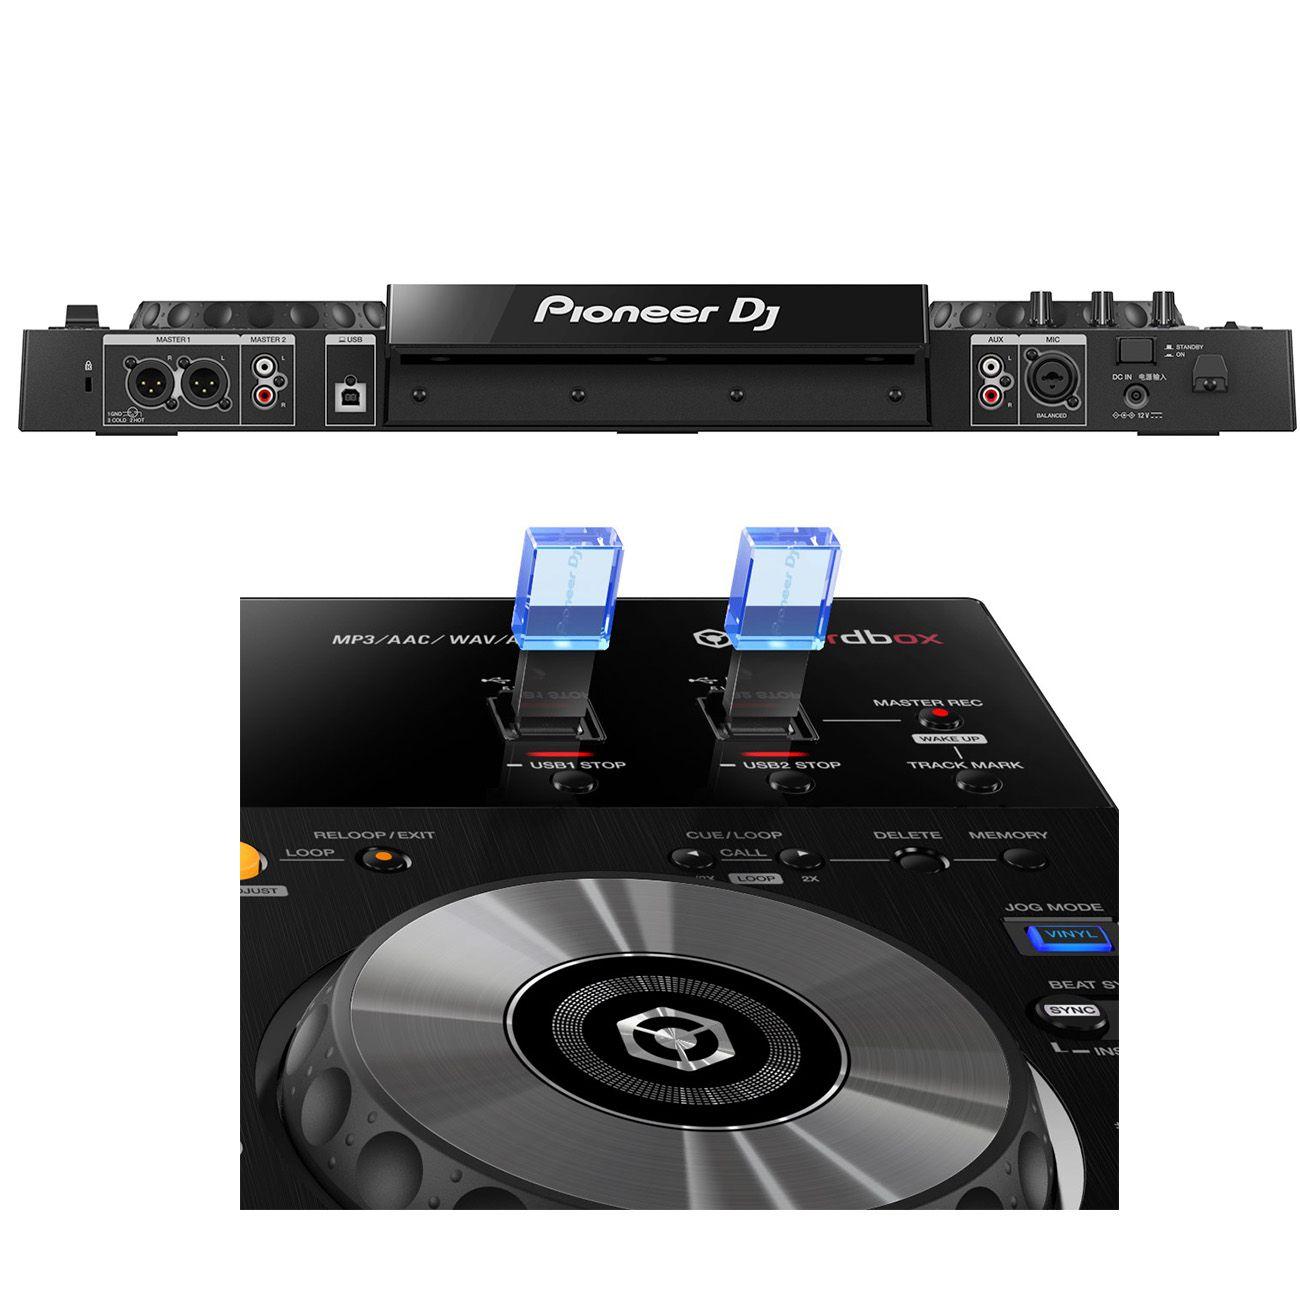 Controladora Pioneer DJ XDJ RR